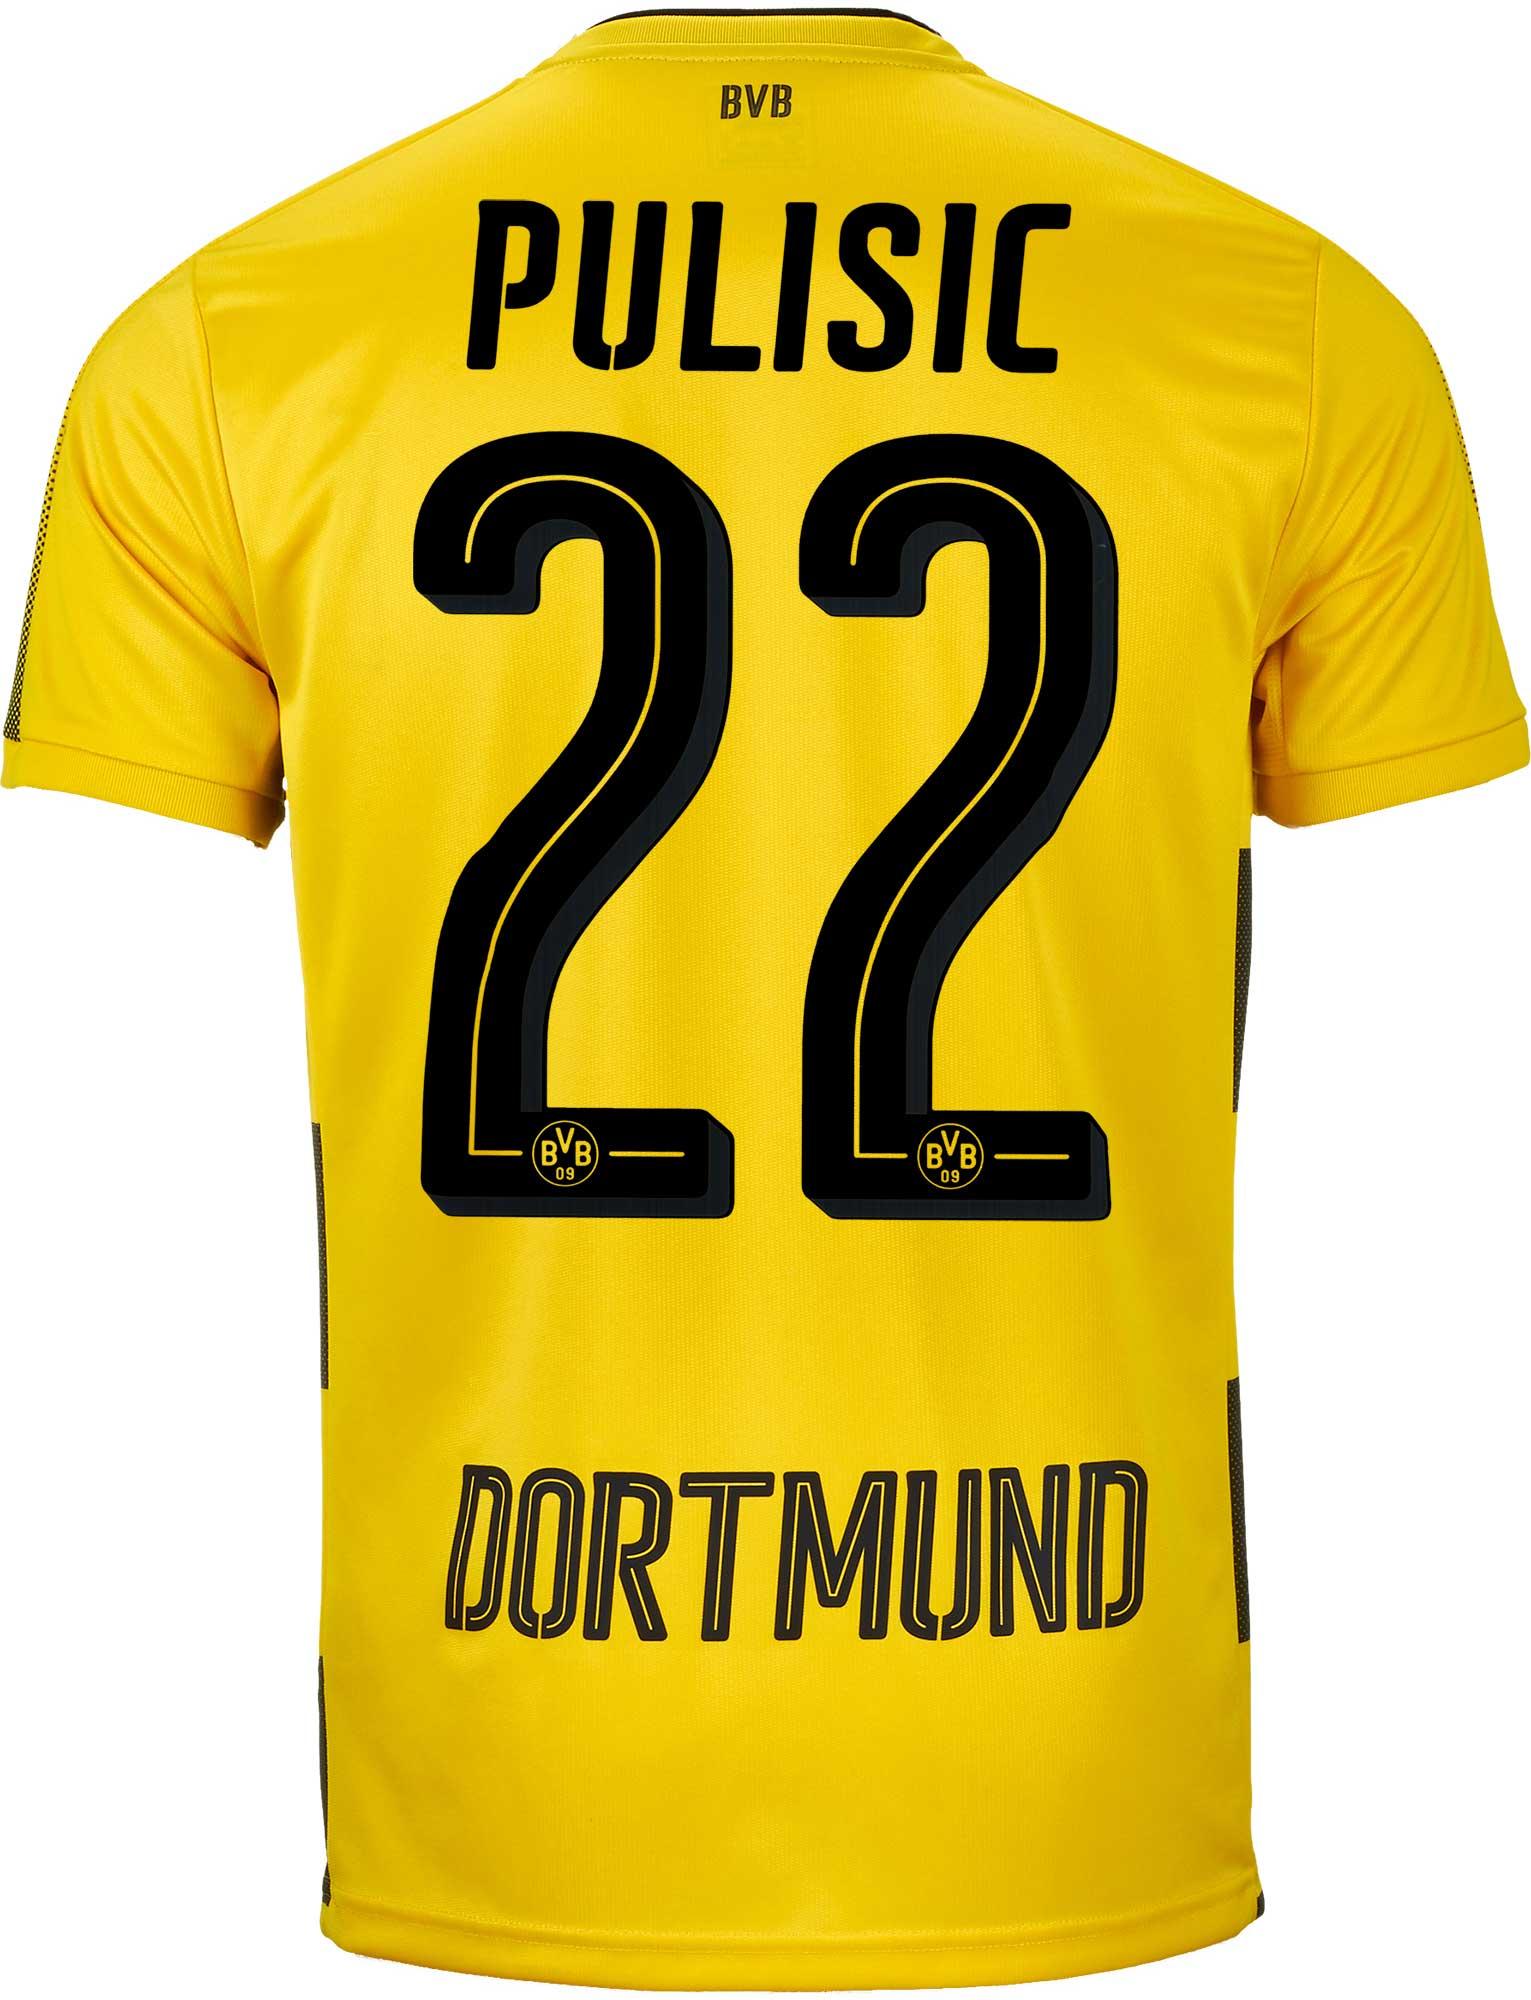 67a38f21b26 2017/18 Puma Christian Pulisic Borussia Dortmund Home Jersey